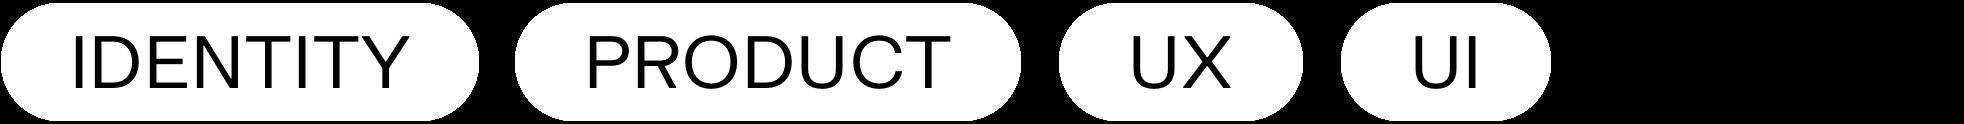 marcostoermer-playmaker-tags